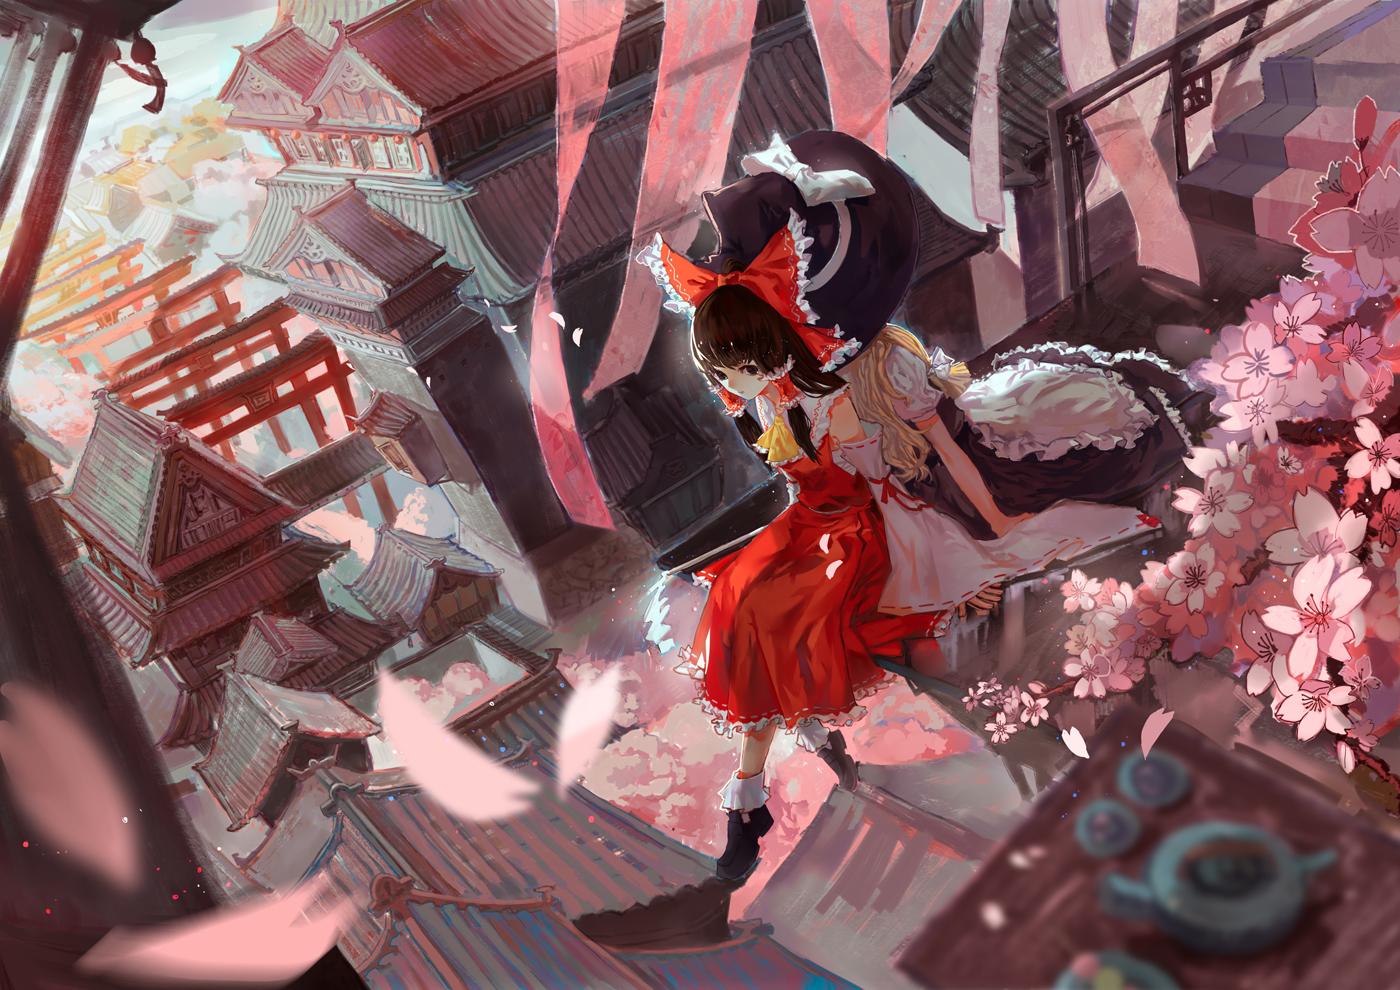 building cherry_blossoms flowers hakurei_reimu hat japanese_clothes kirisame_marisa miko petals touhou witch witch_hat xiayu93